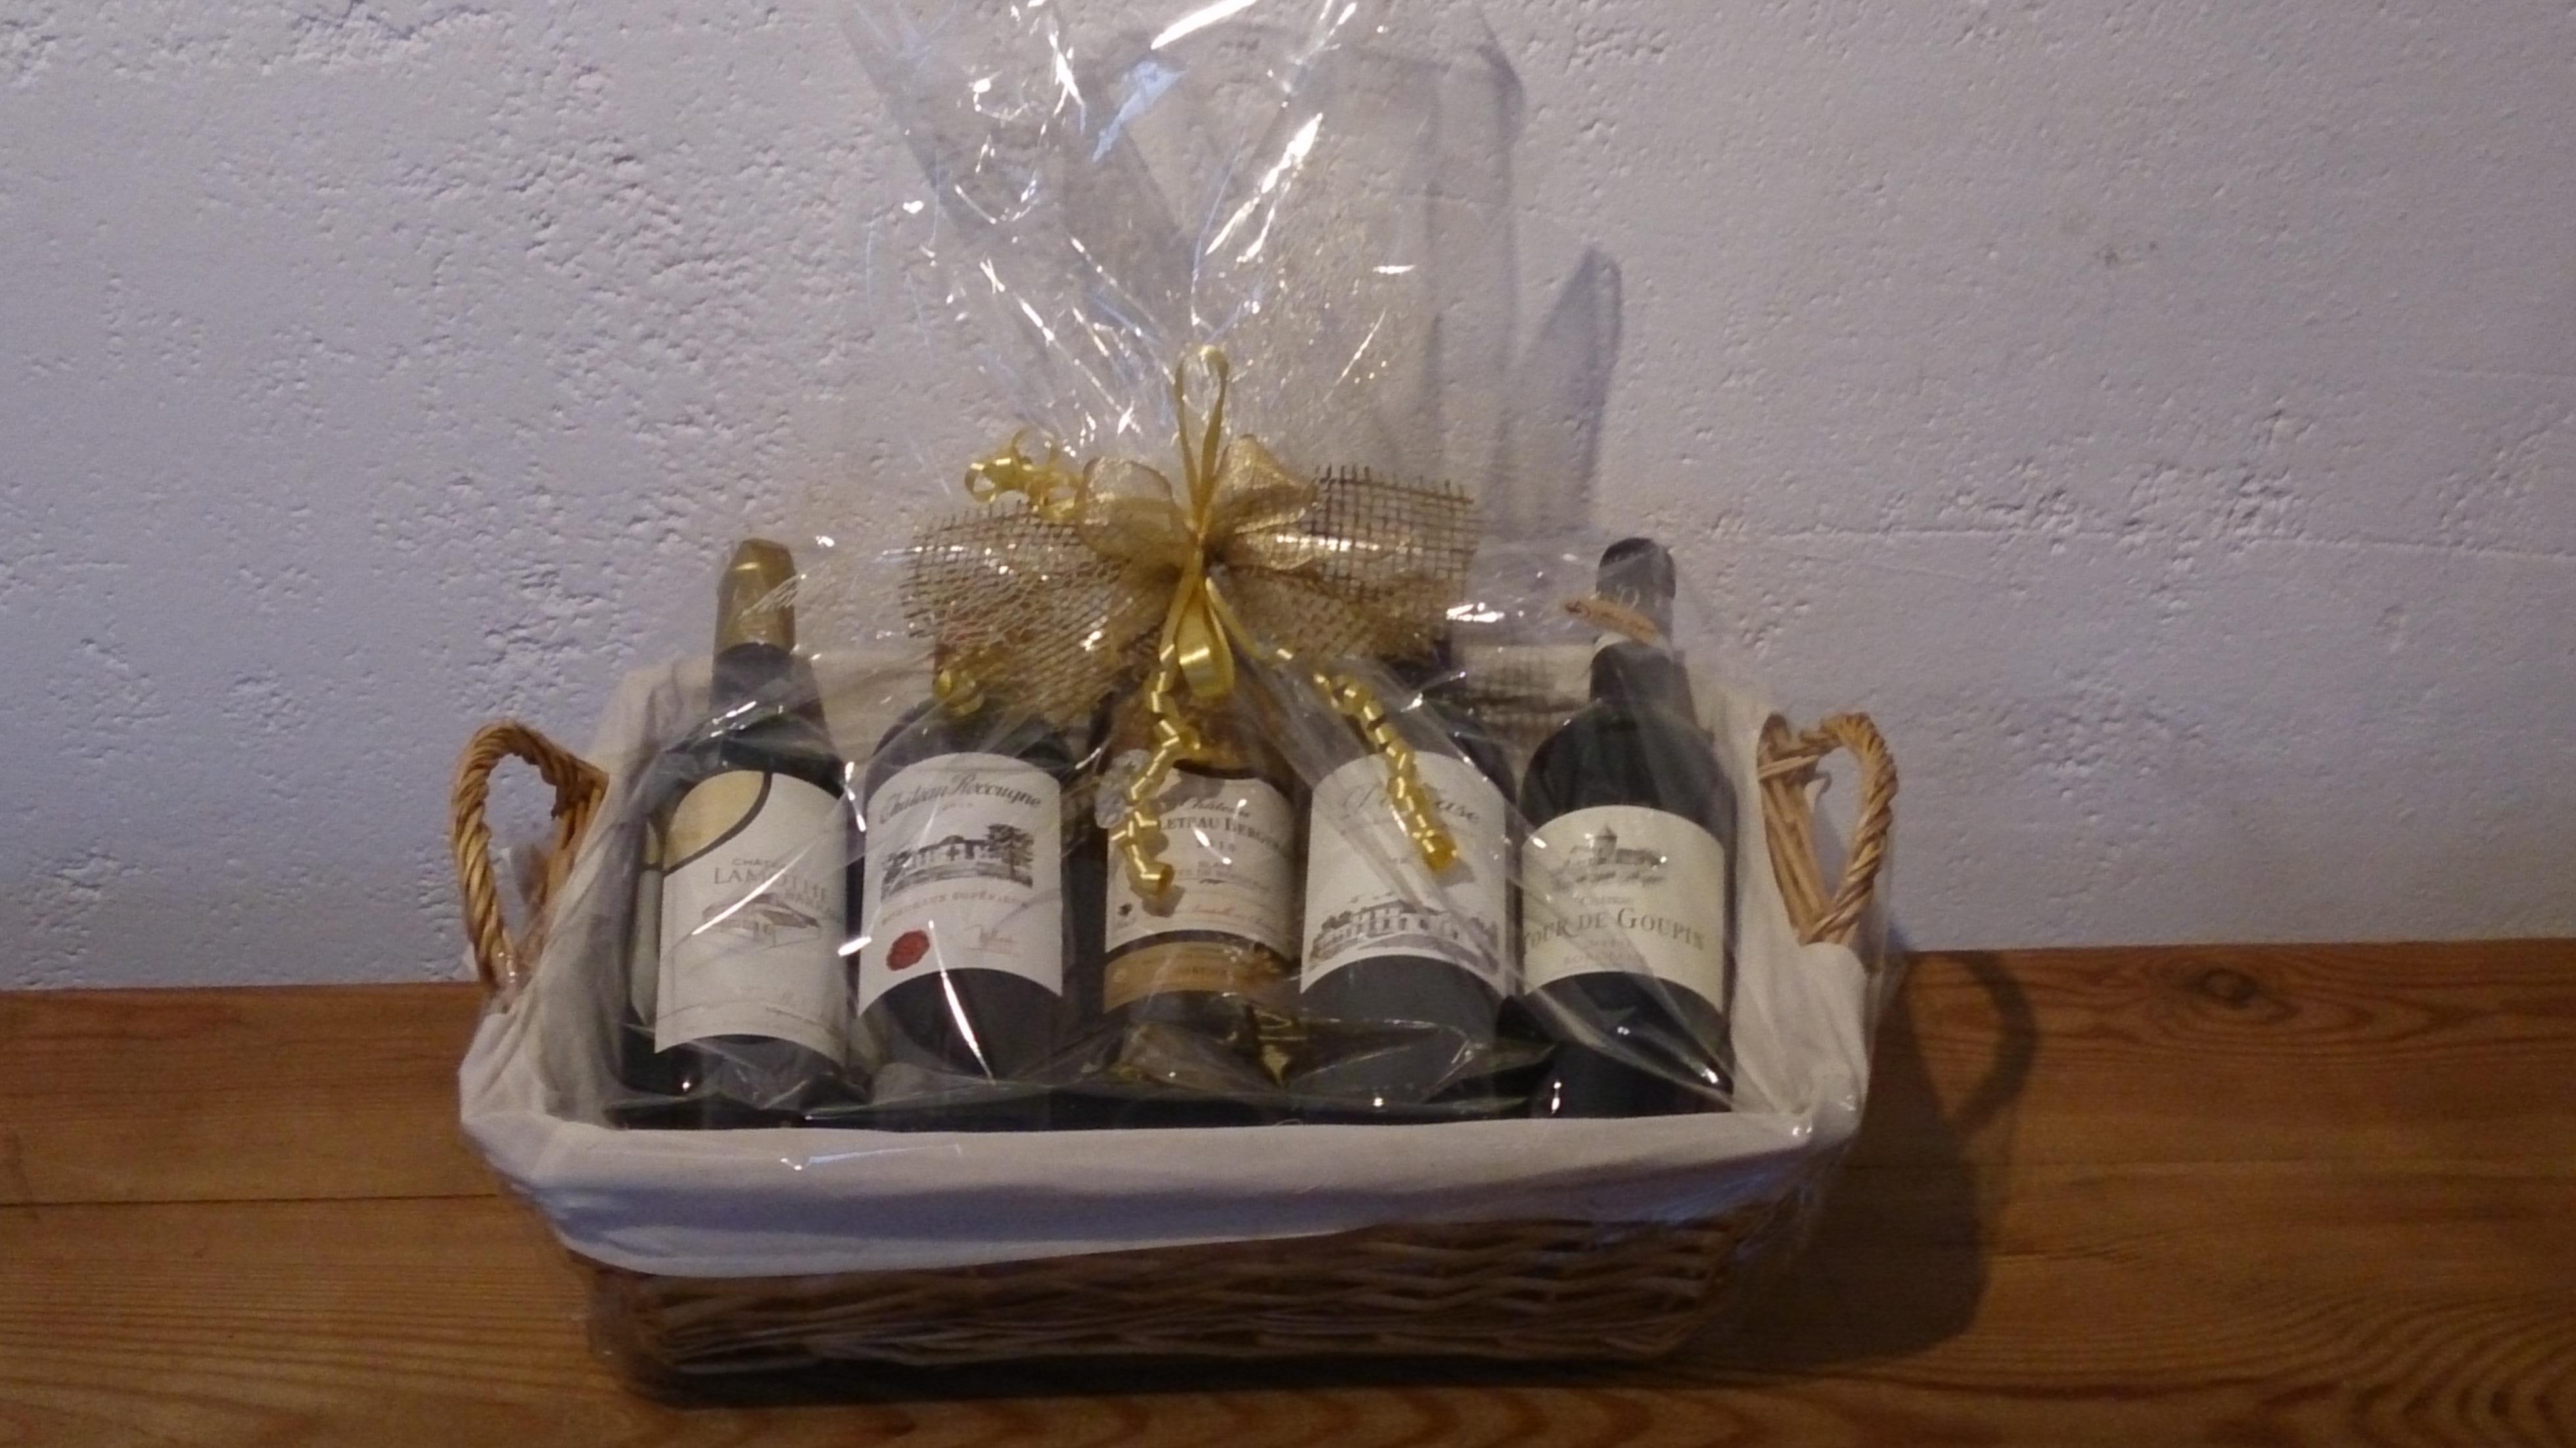 http://www.wijnendeprez.be/wp-content/uploads/2014/12/DSC_0036.jpg